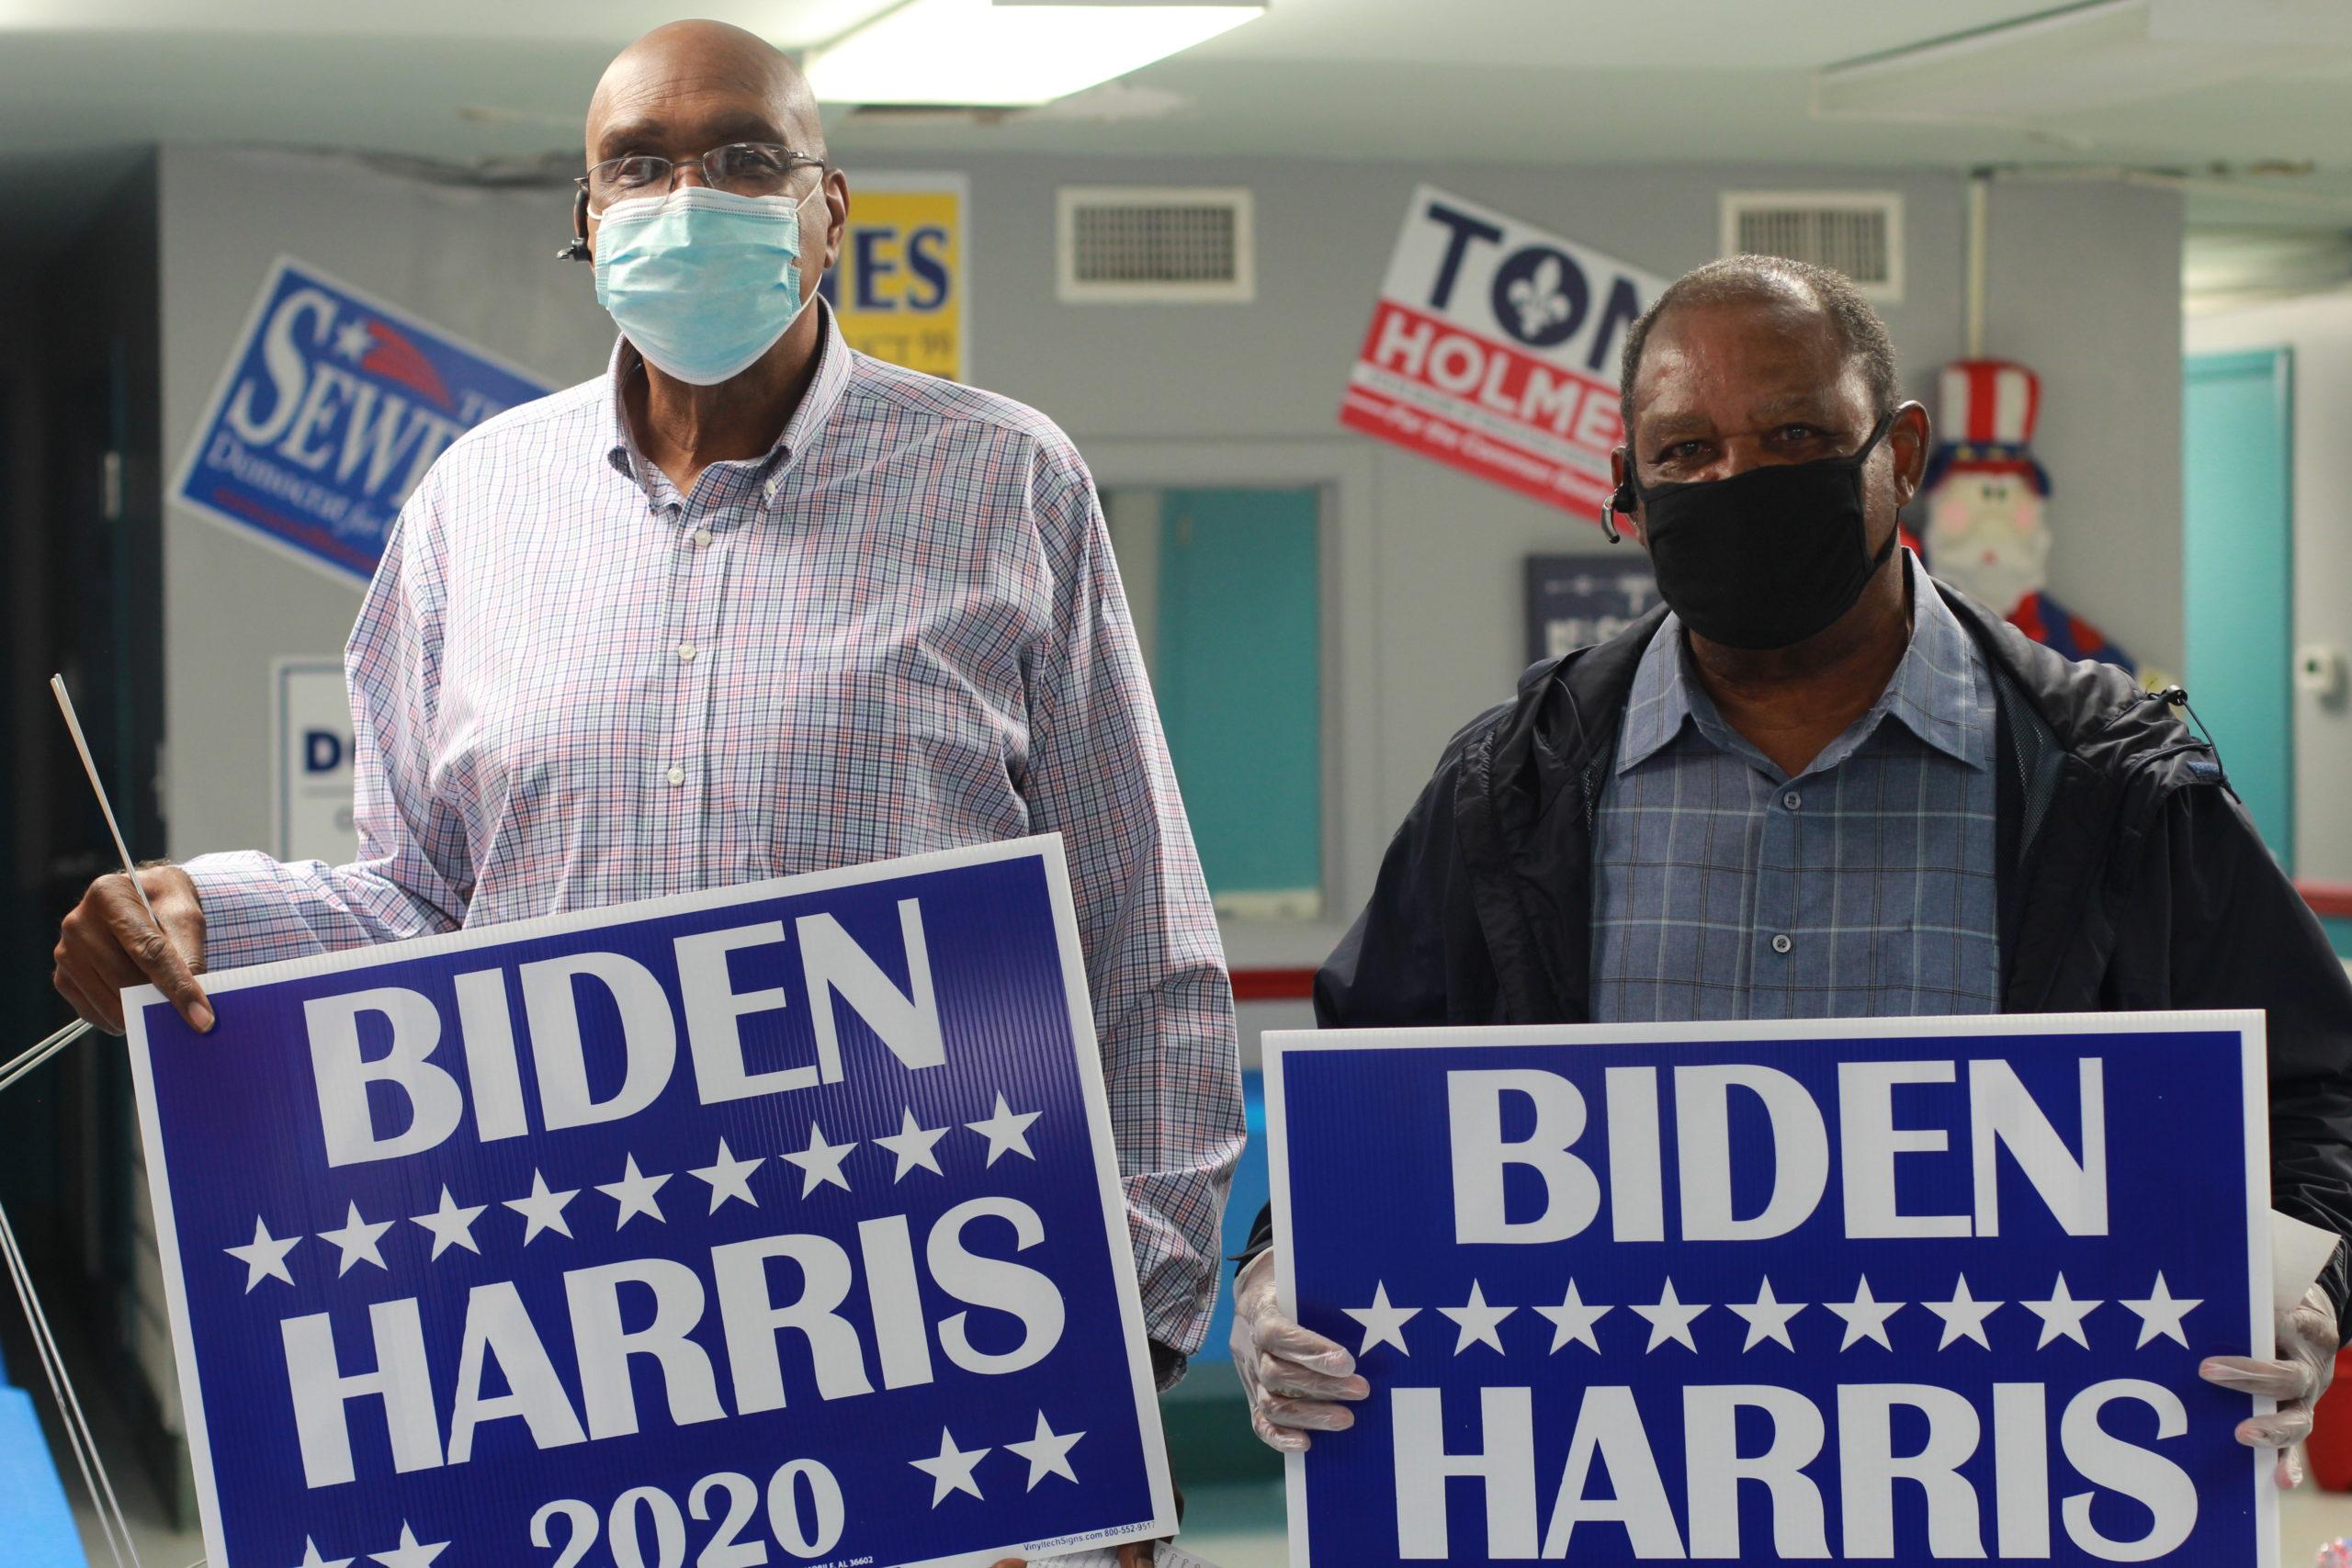 Men holding Biden Harris yard signs